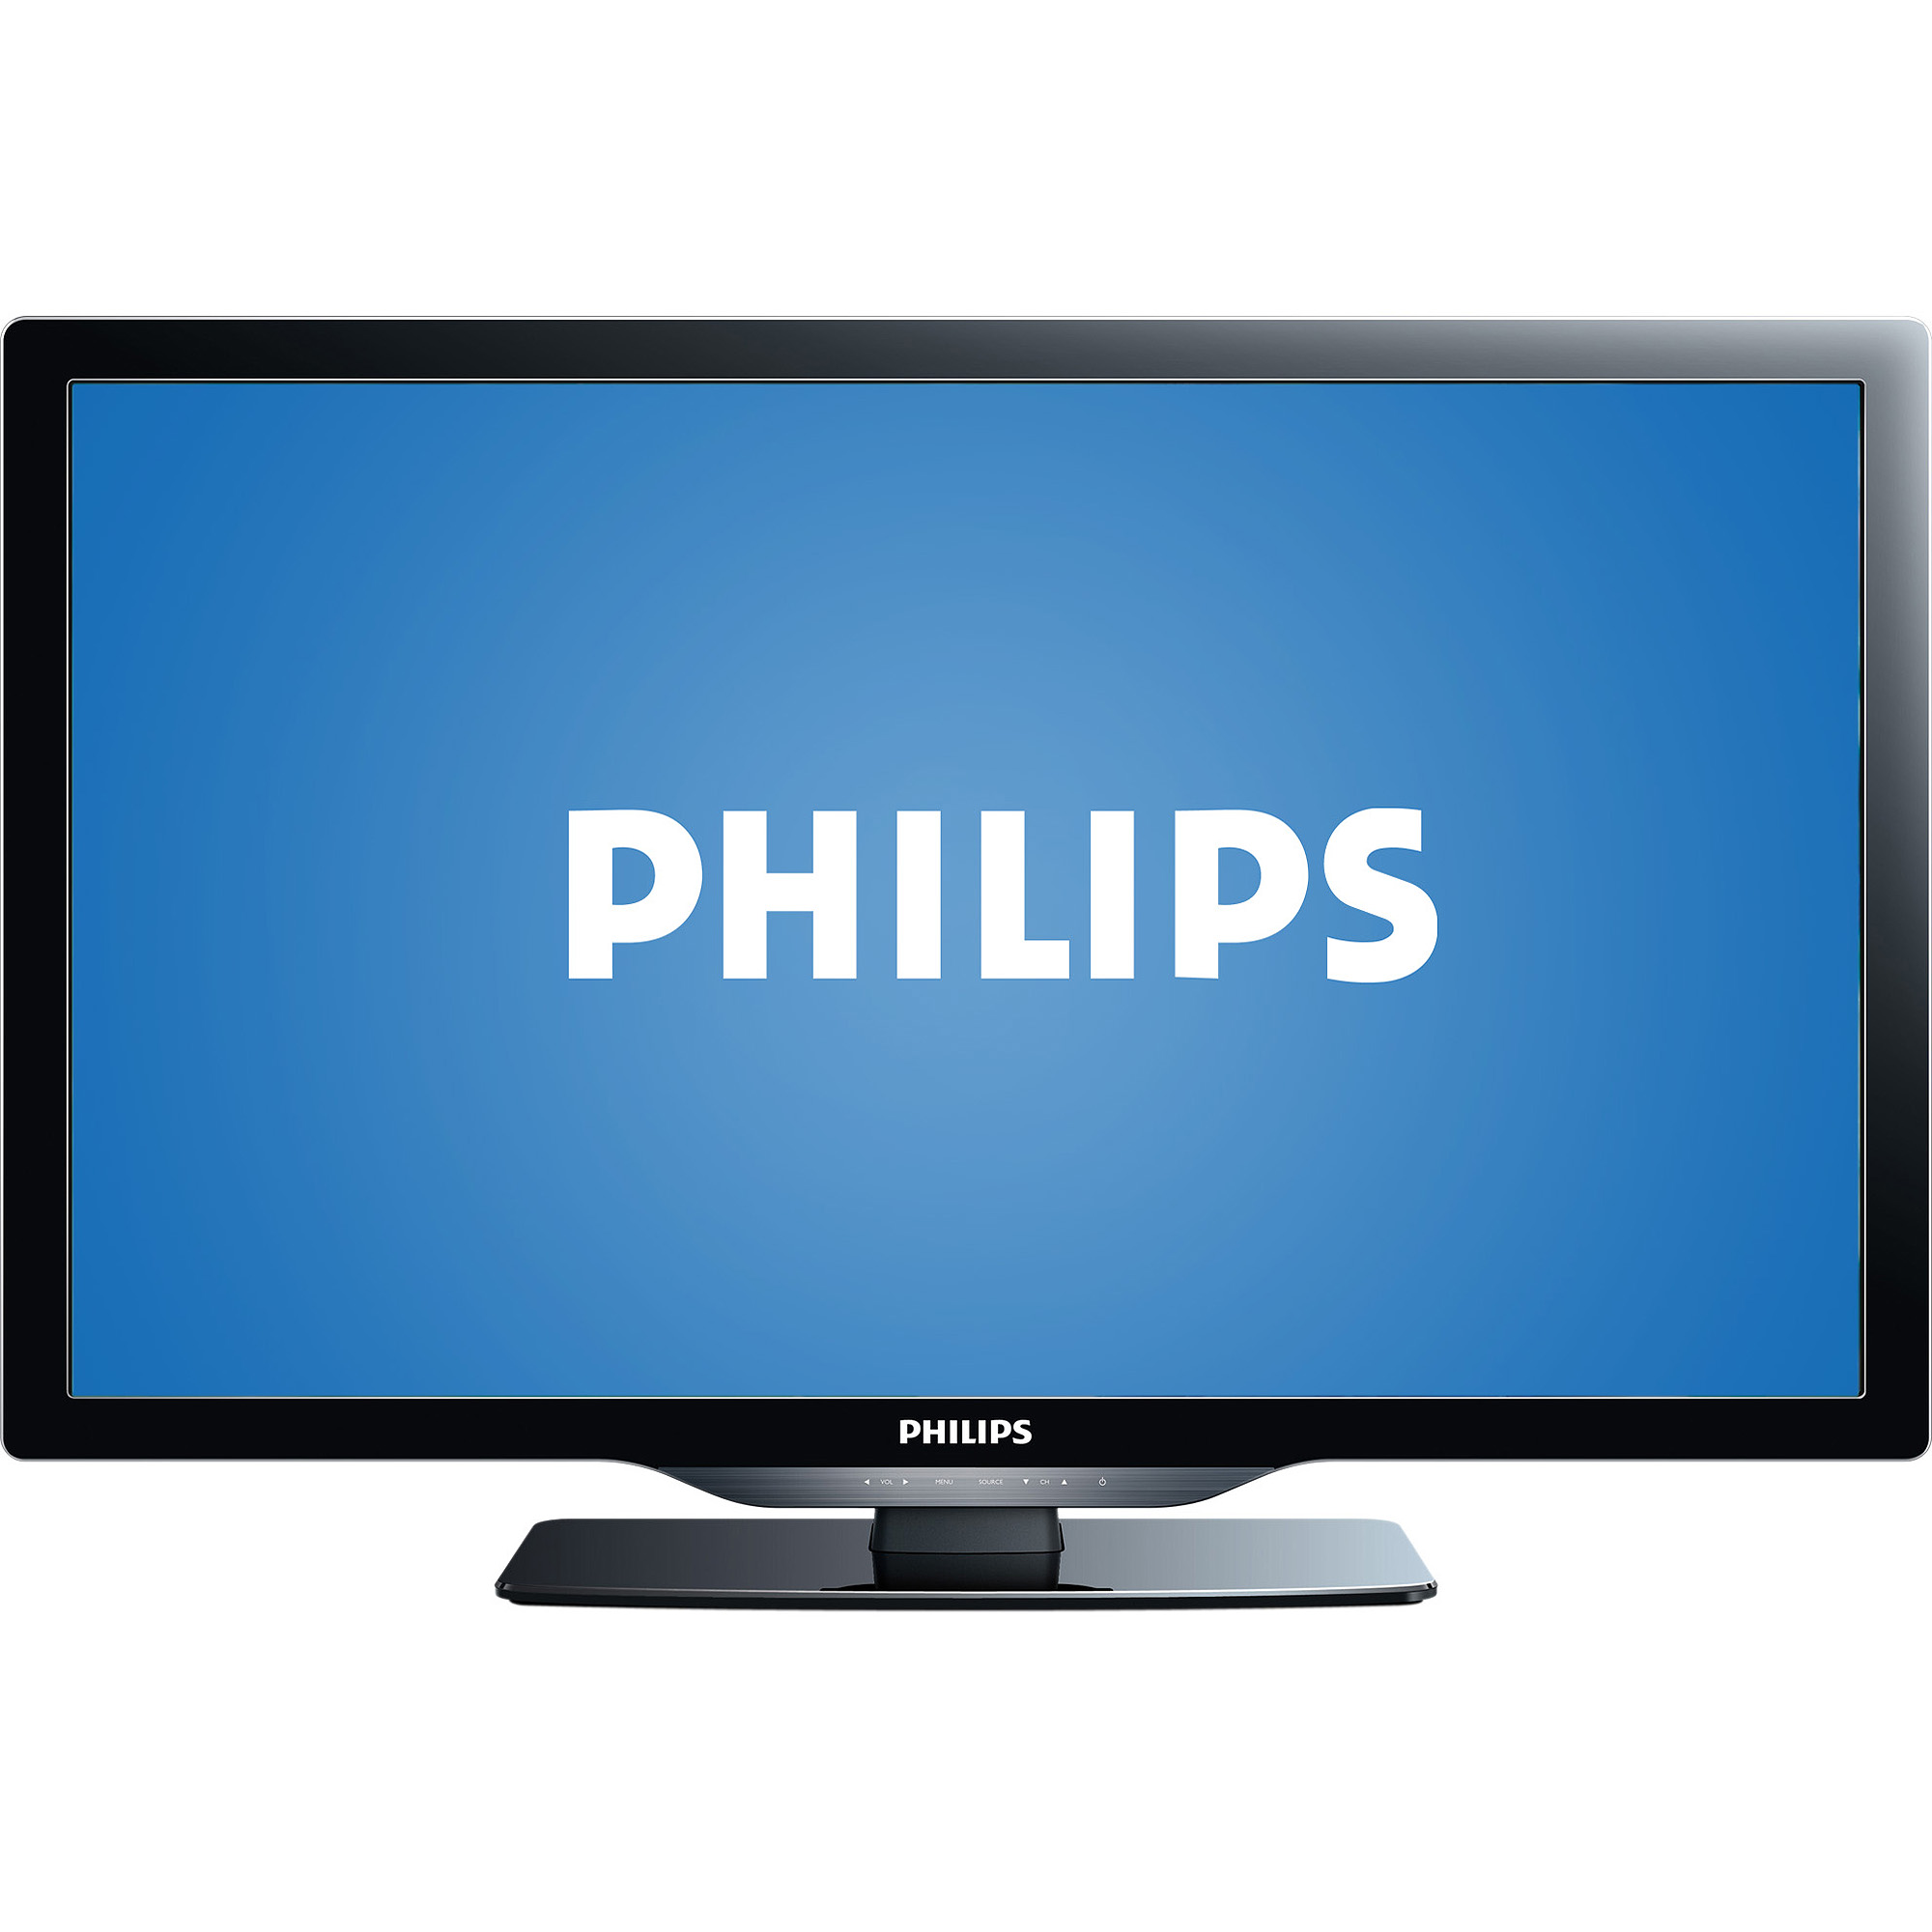 "Philips 22"" Class LED 720p 60Hz HDTV, (2.11"" ultra-slim) 22PFL4907/F7"